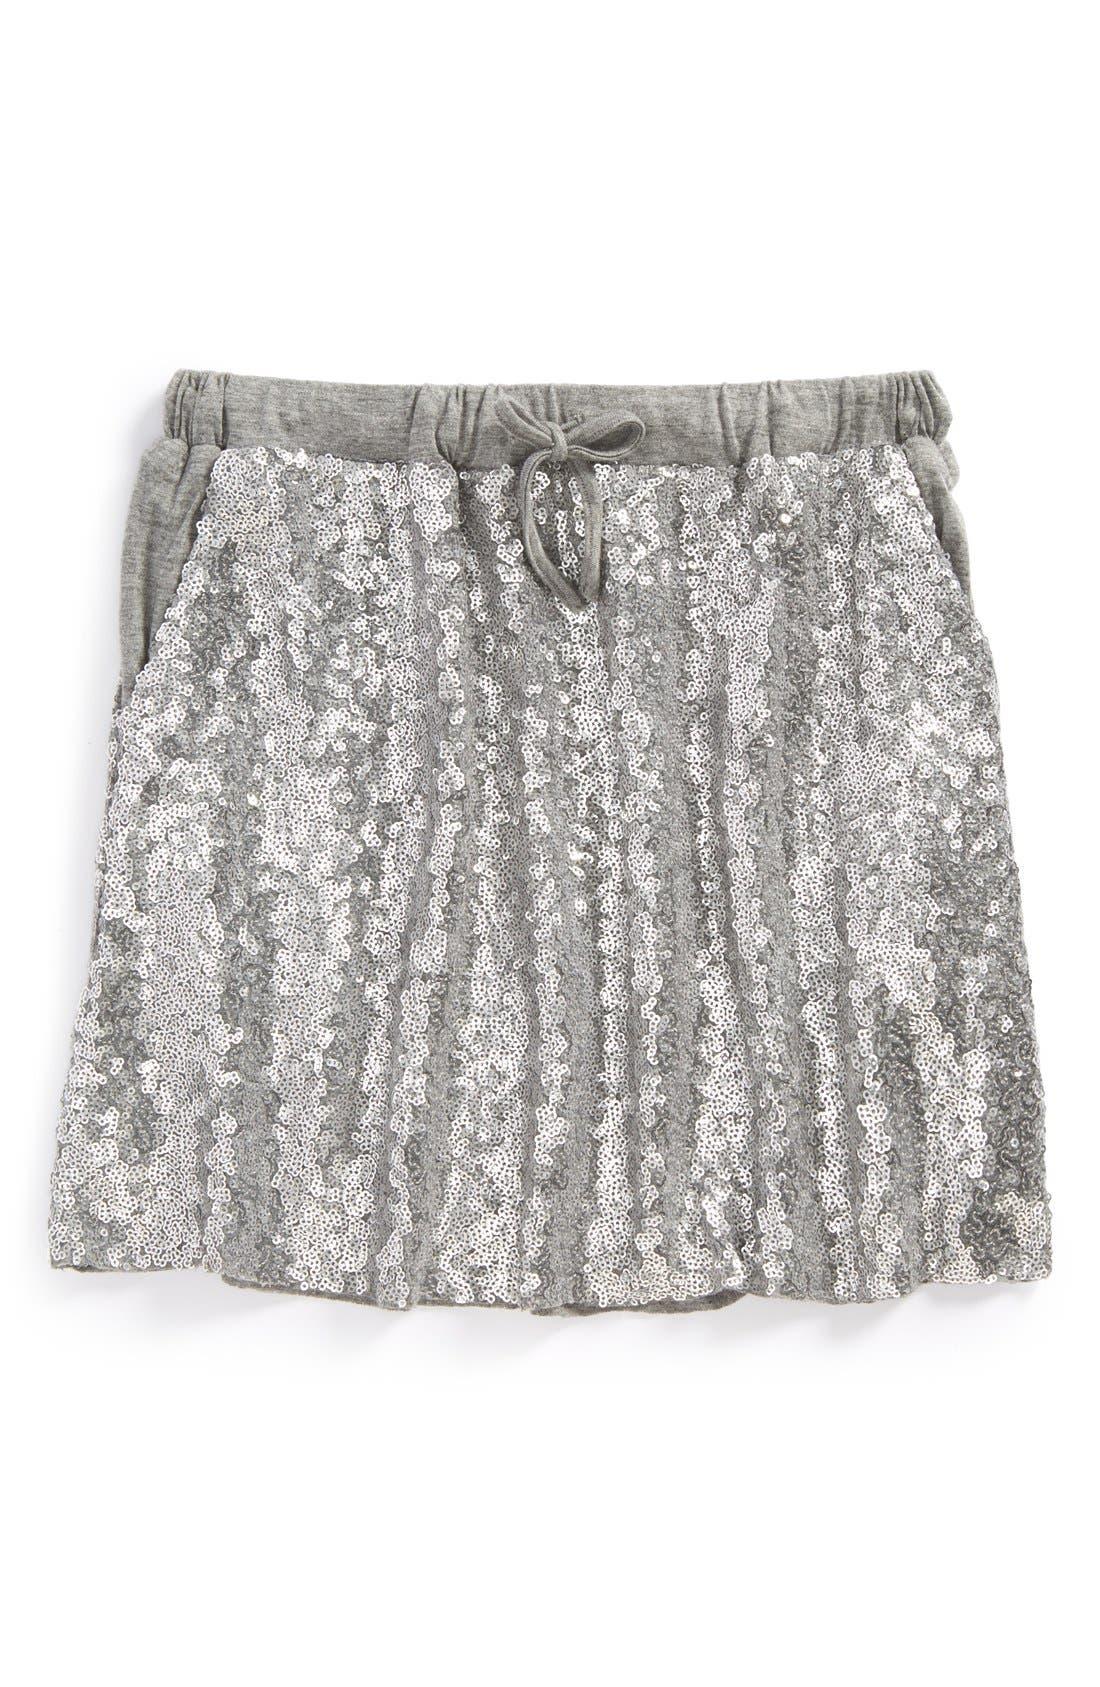 Main Image - Peek 'New Zoe' Sequin Skirt (Little Girls & Big Girls)